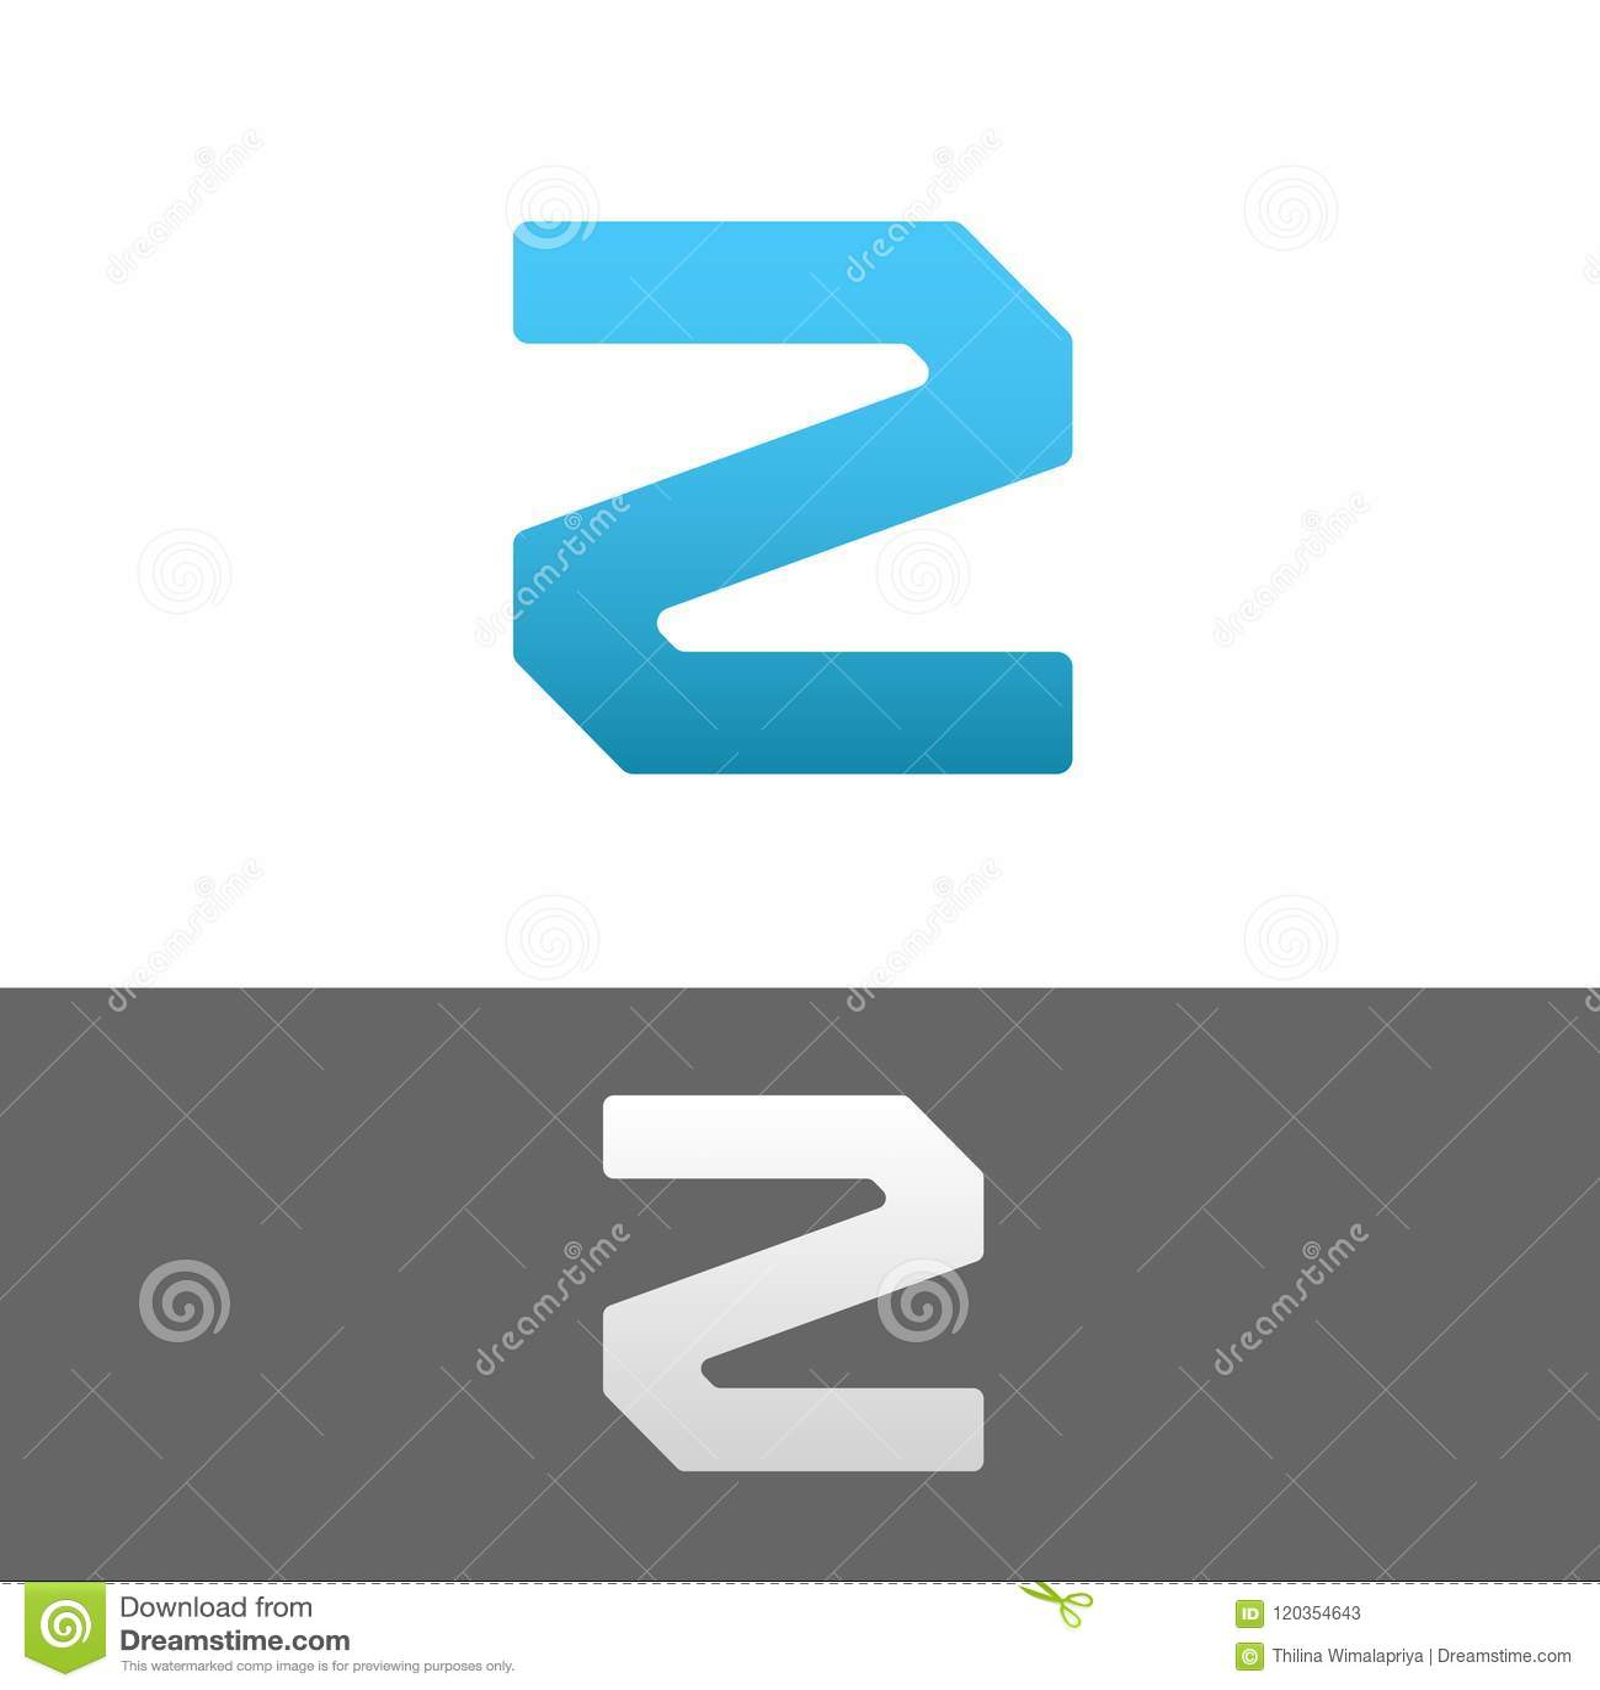 Z Letter Alphabet Abstract Text Logo Template Stock Vector